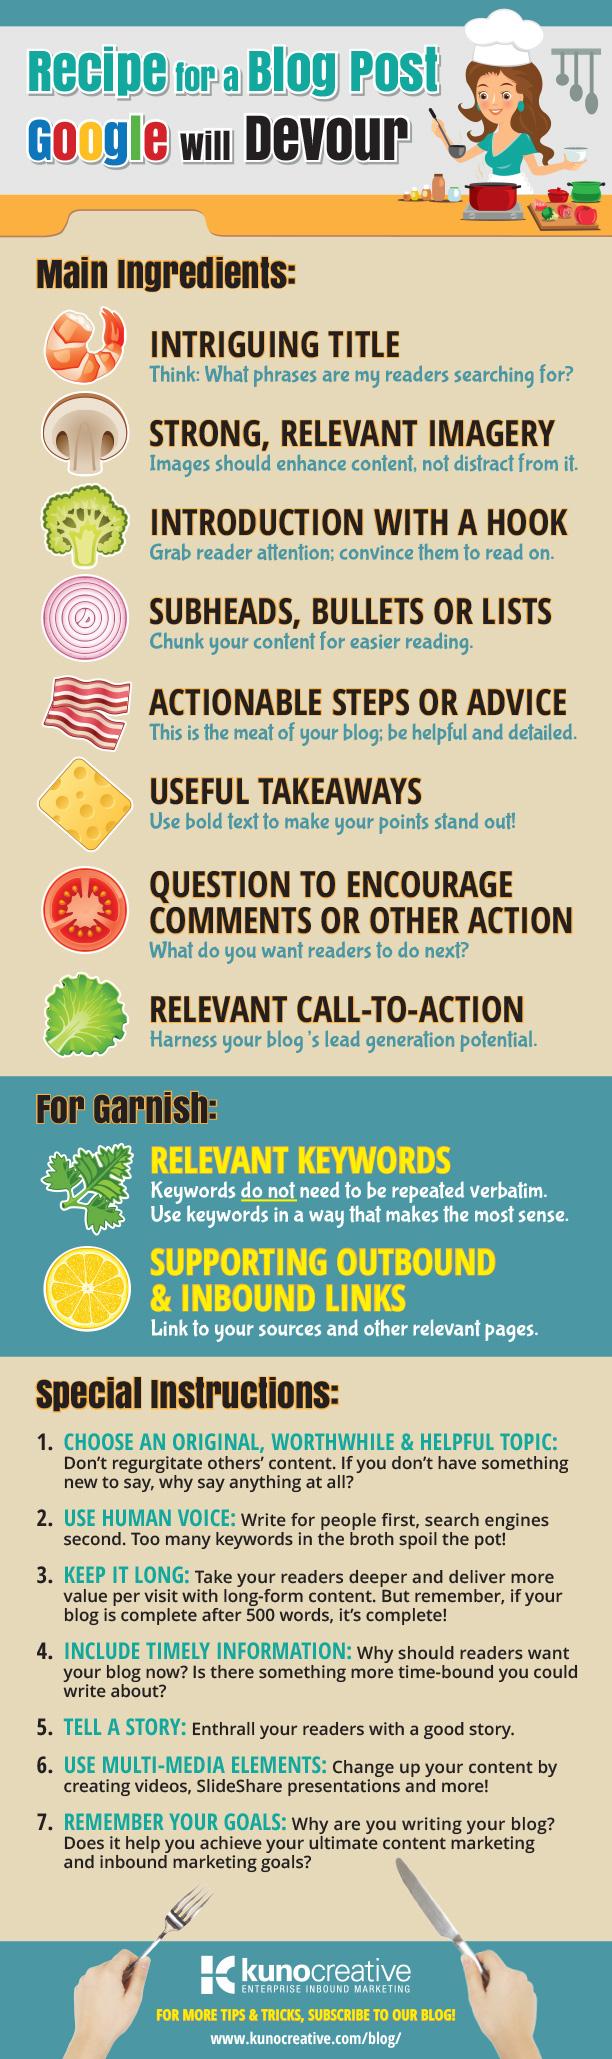 blog recipe kuno creative infographic